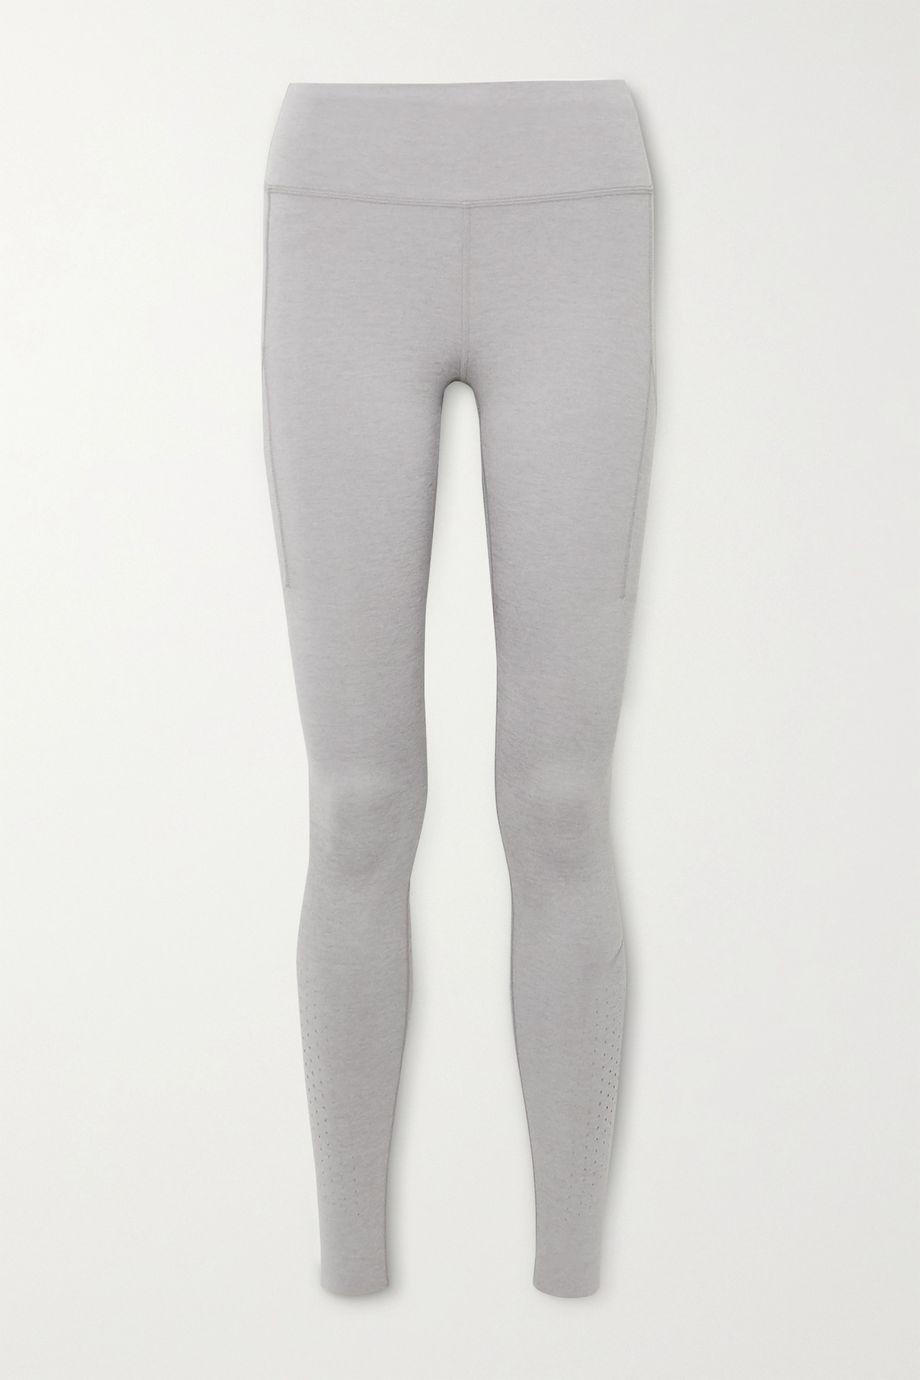 Nike Epic Lux perforated Dri-FIT stretch leggings